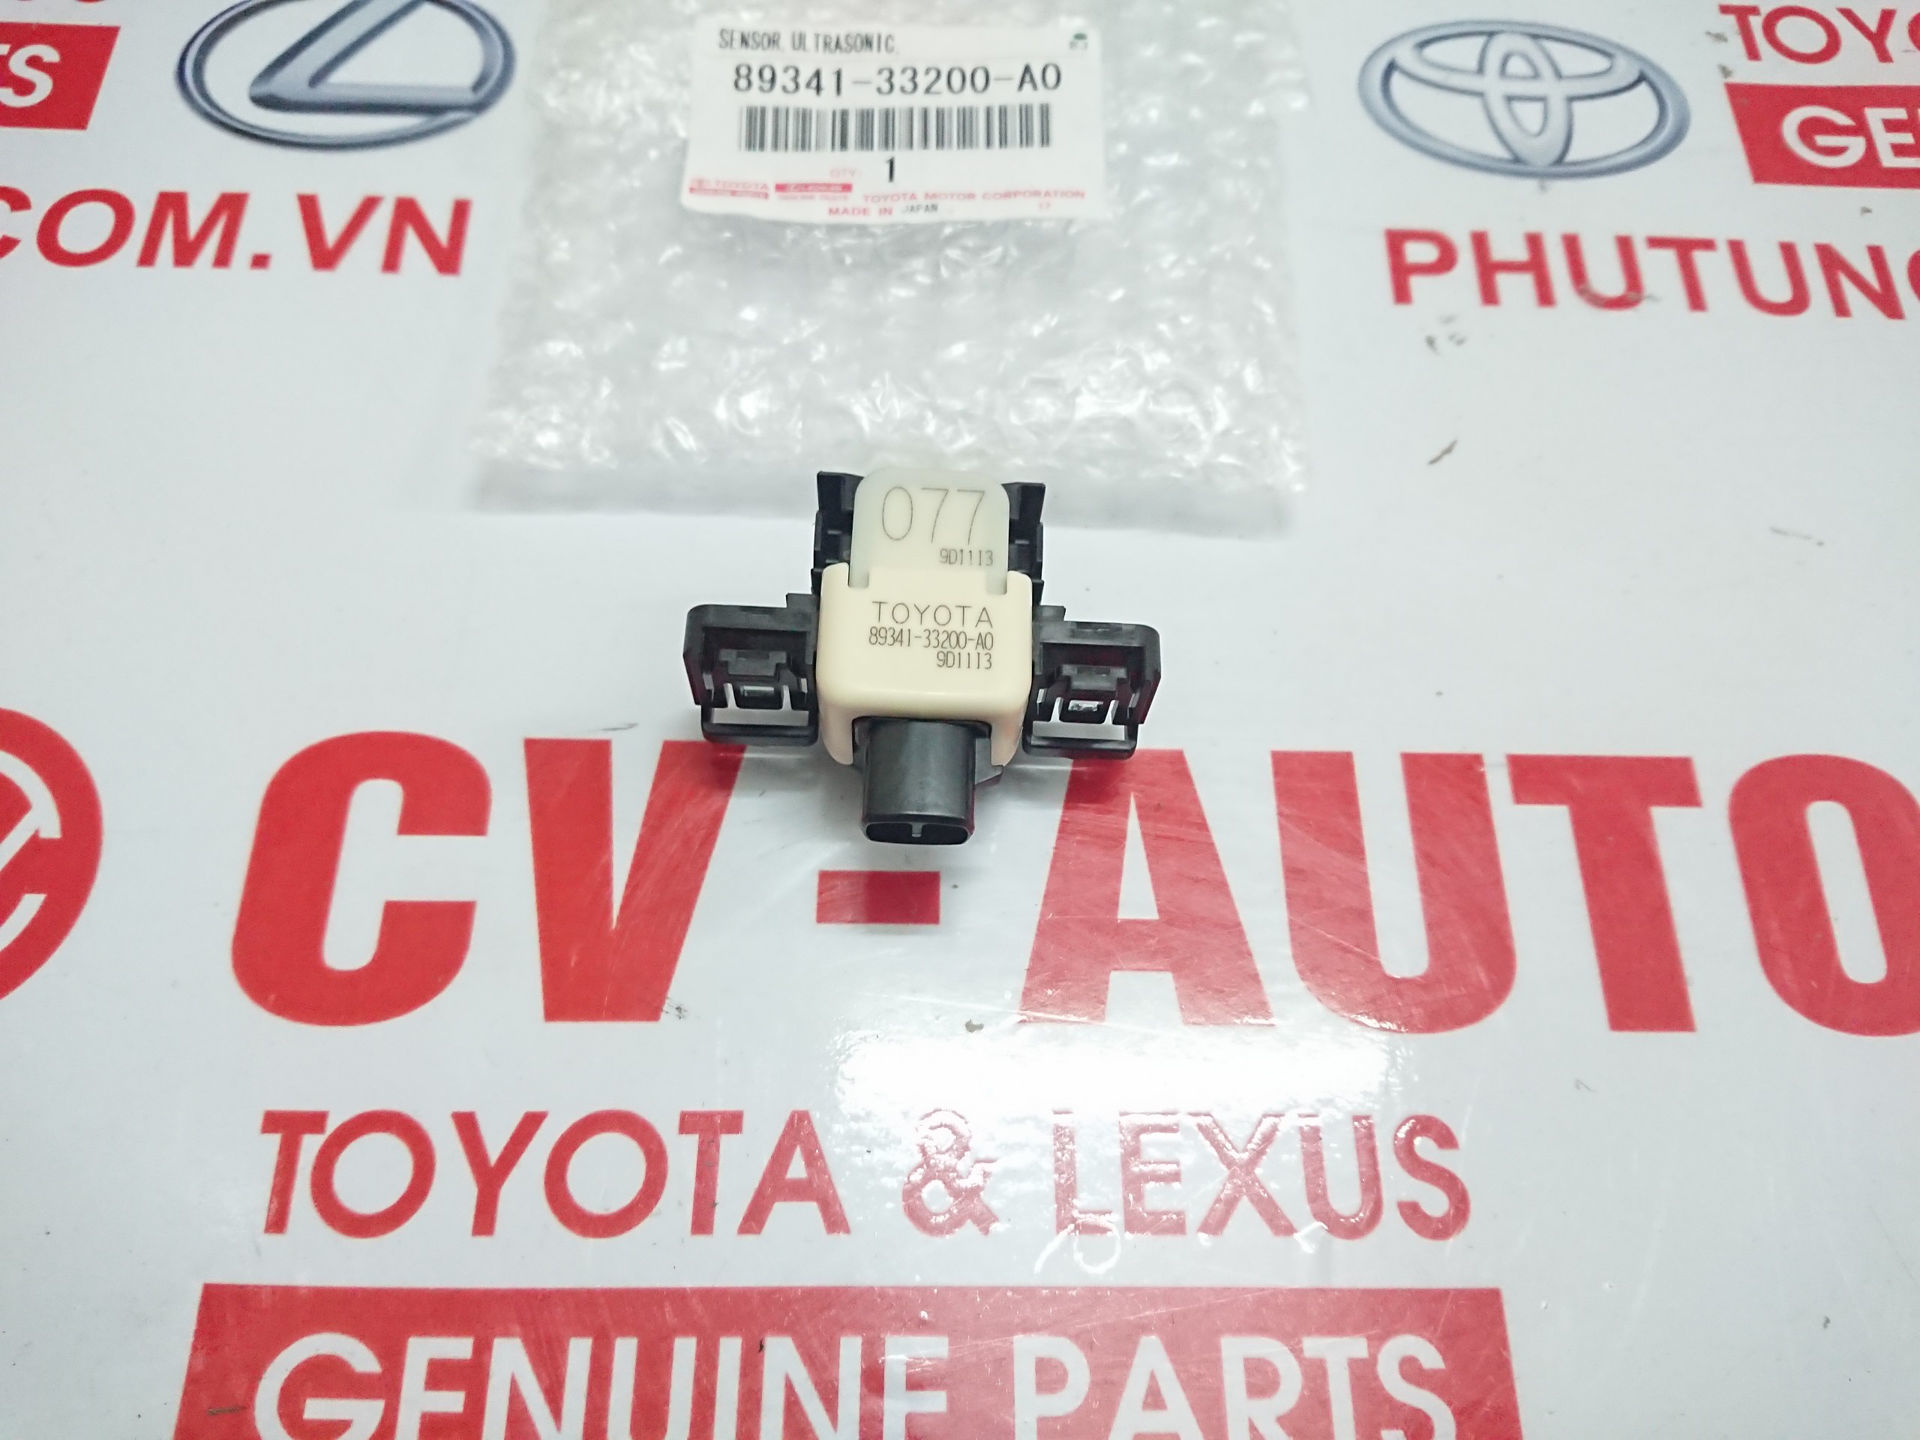 Picture of 89341-33200-A0 Cảm biến khoảng cách Lexus ES350 chính hãng